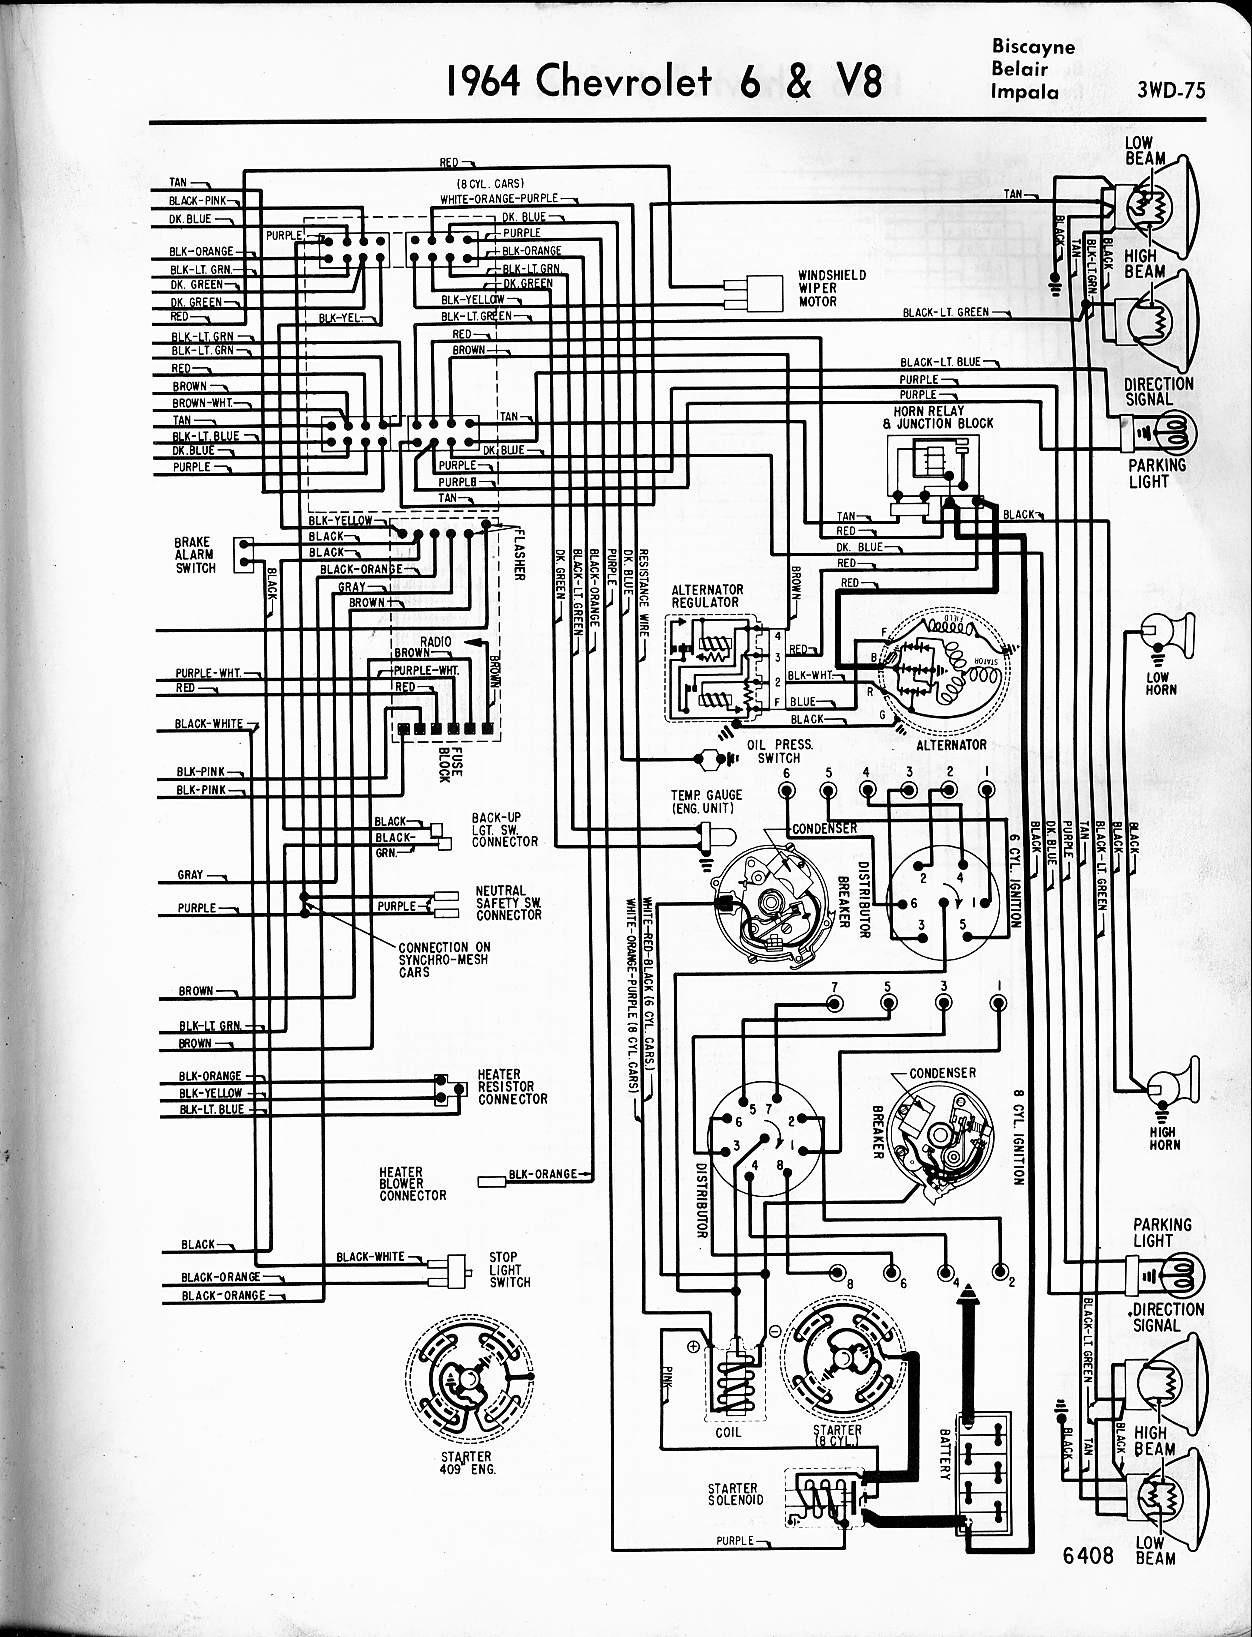 1964 chevy coil wiring diagrams wiring diagram data Ballast Resistor Wiring Diagram Buick 1964 chevrolet impala wiring diagram wiring library 1964 chevy coil wiring diagrams